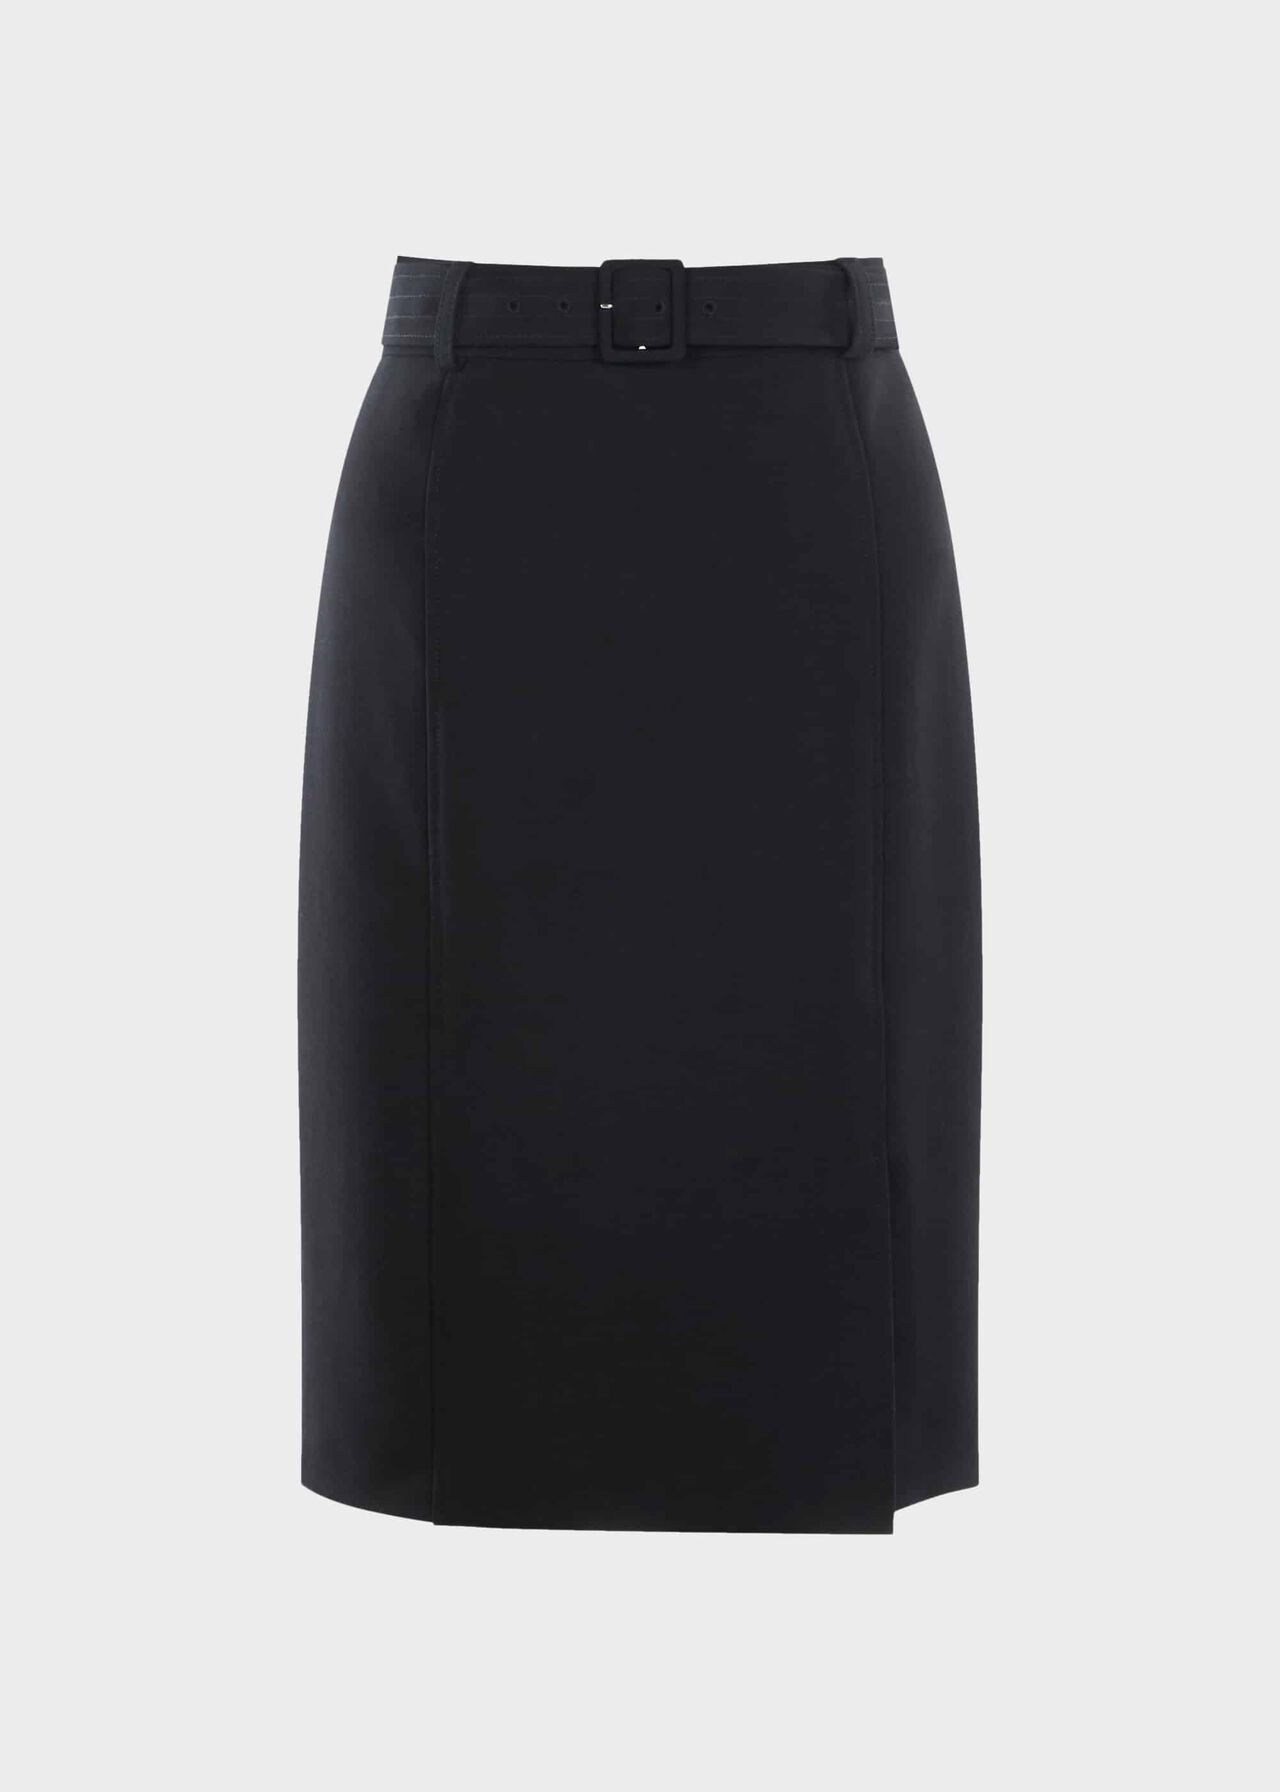 Bella Skirt Black